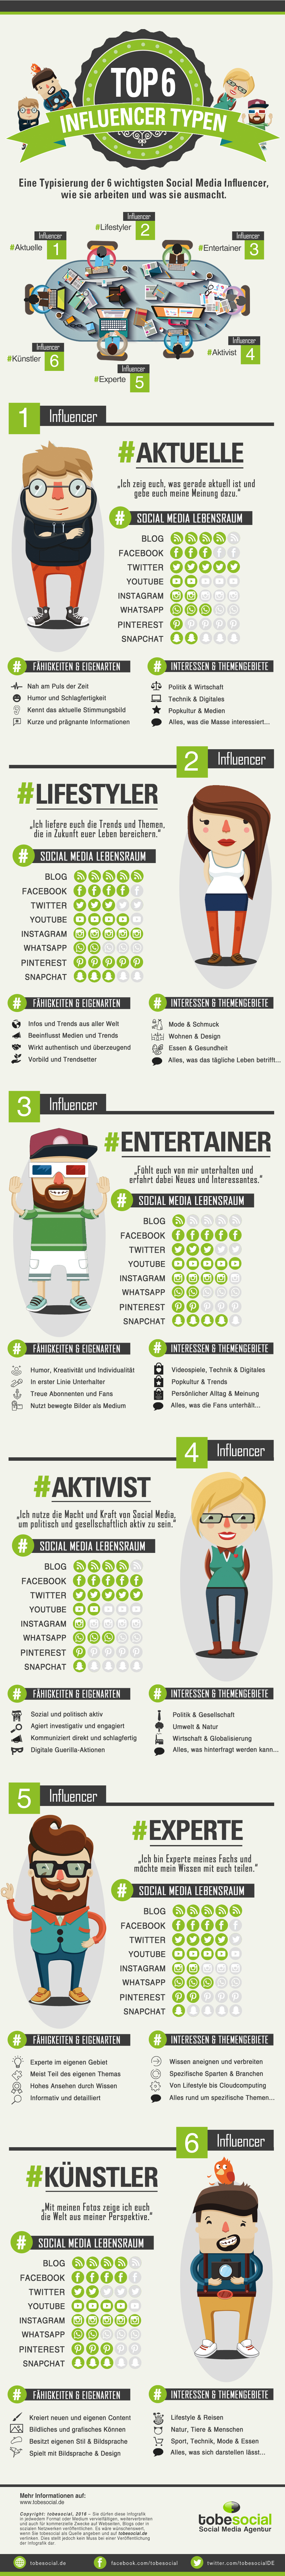 Meinungsmacher im Social Media